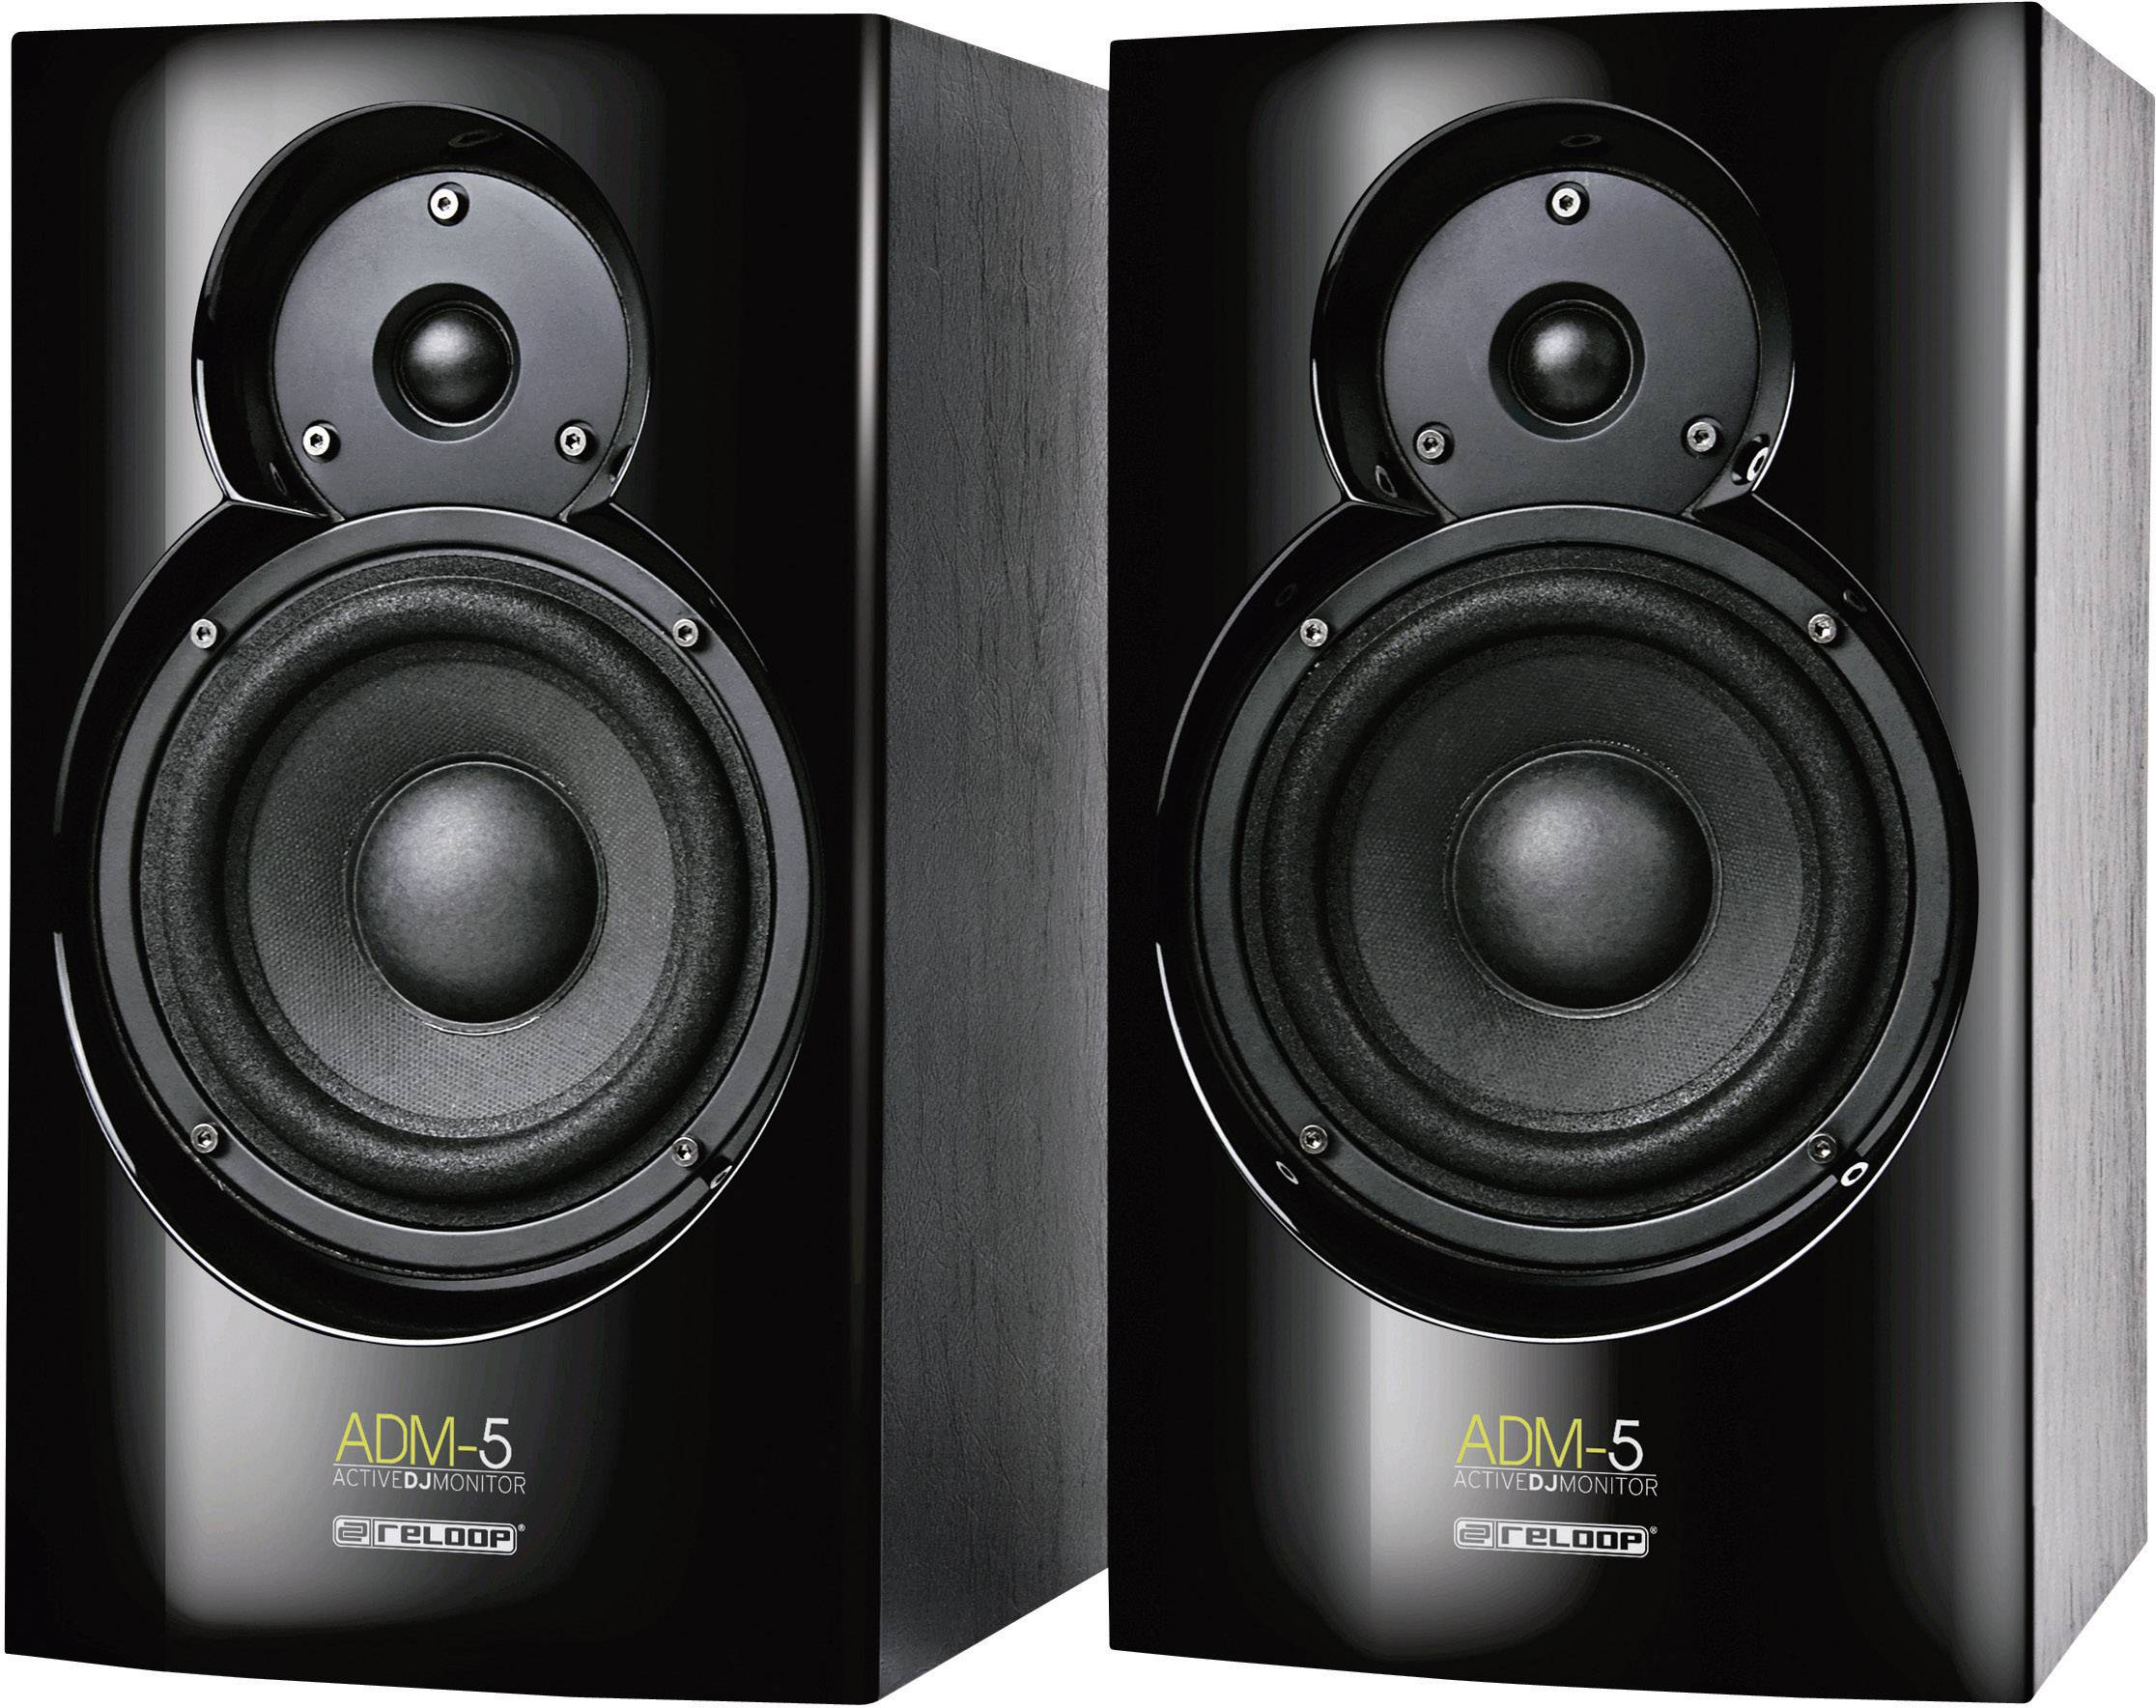 Aktivní monitory Reloop ADM-5, 8 Ω, 76 dB, 2 x 30/60 W, černá